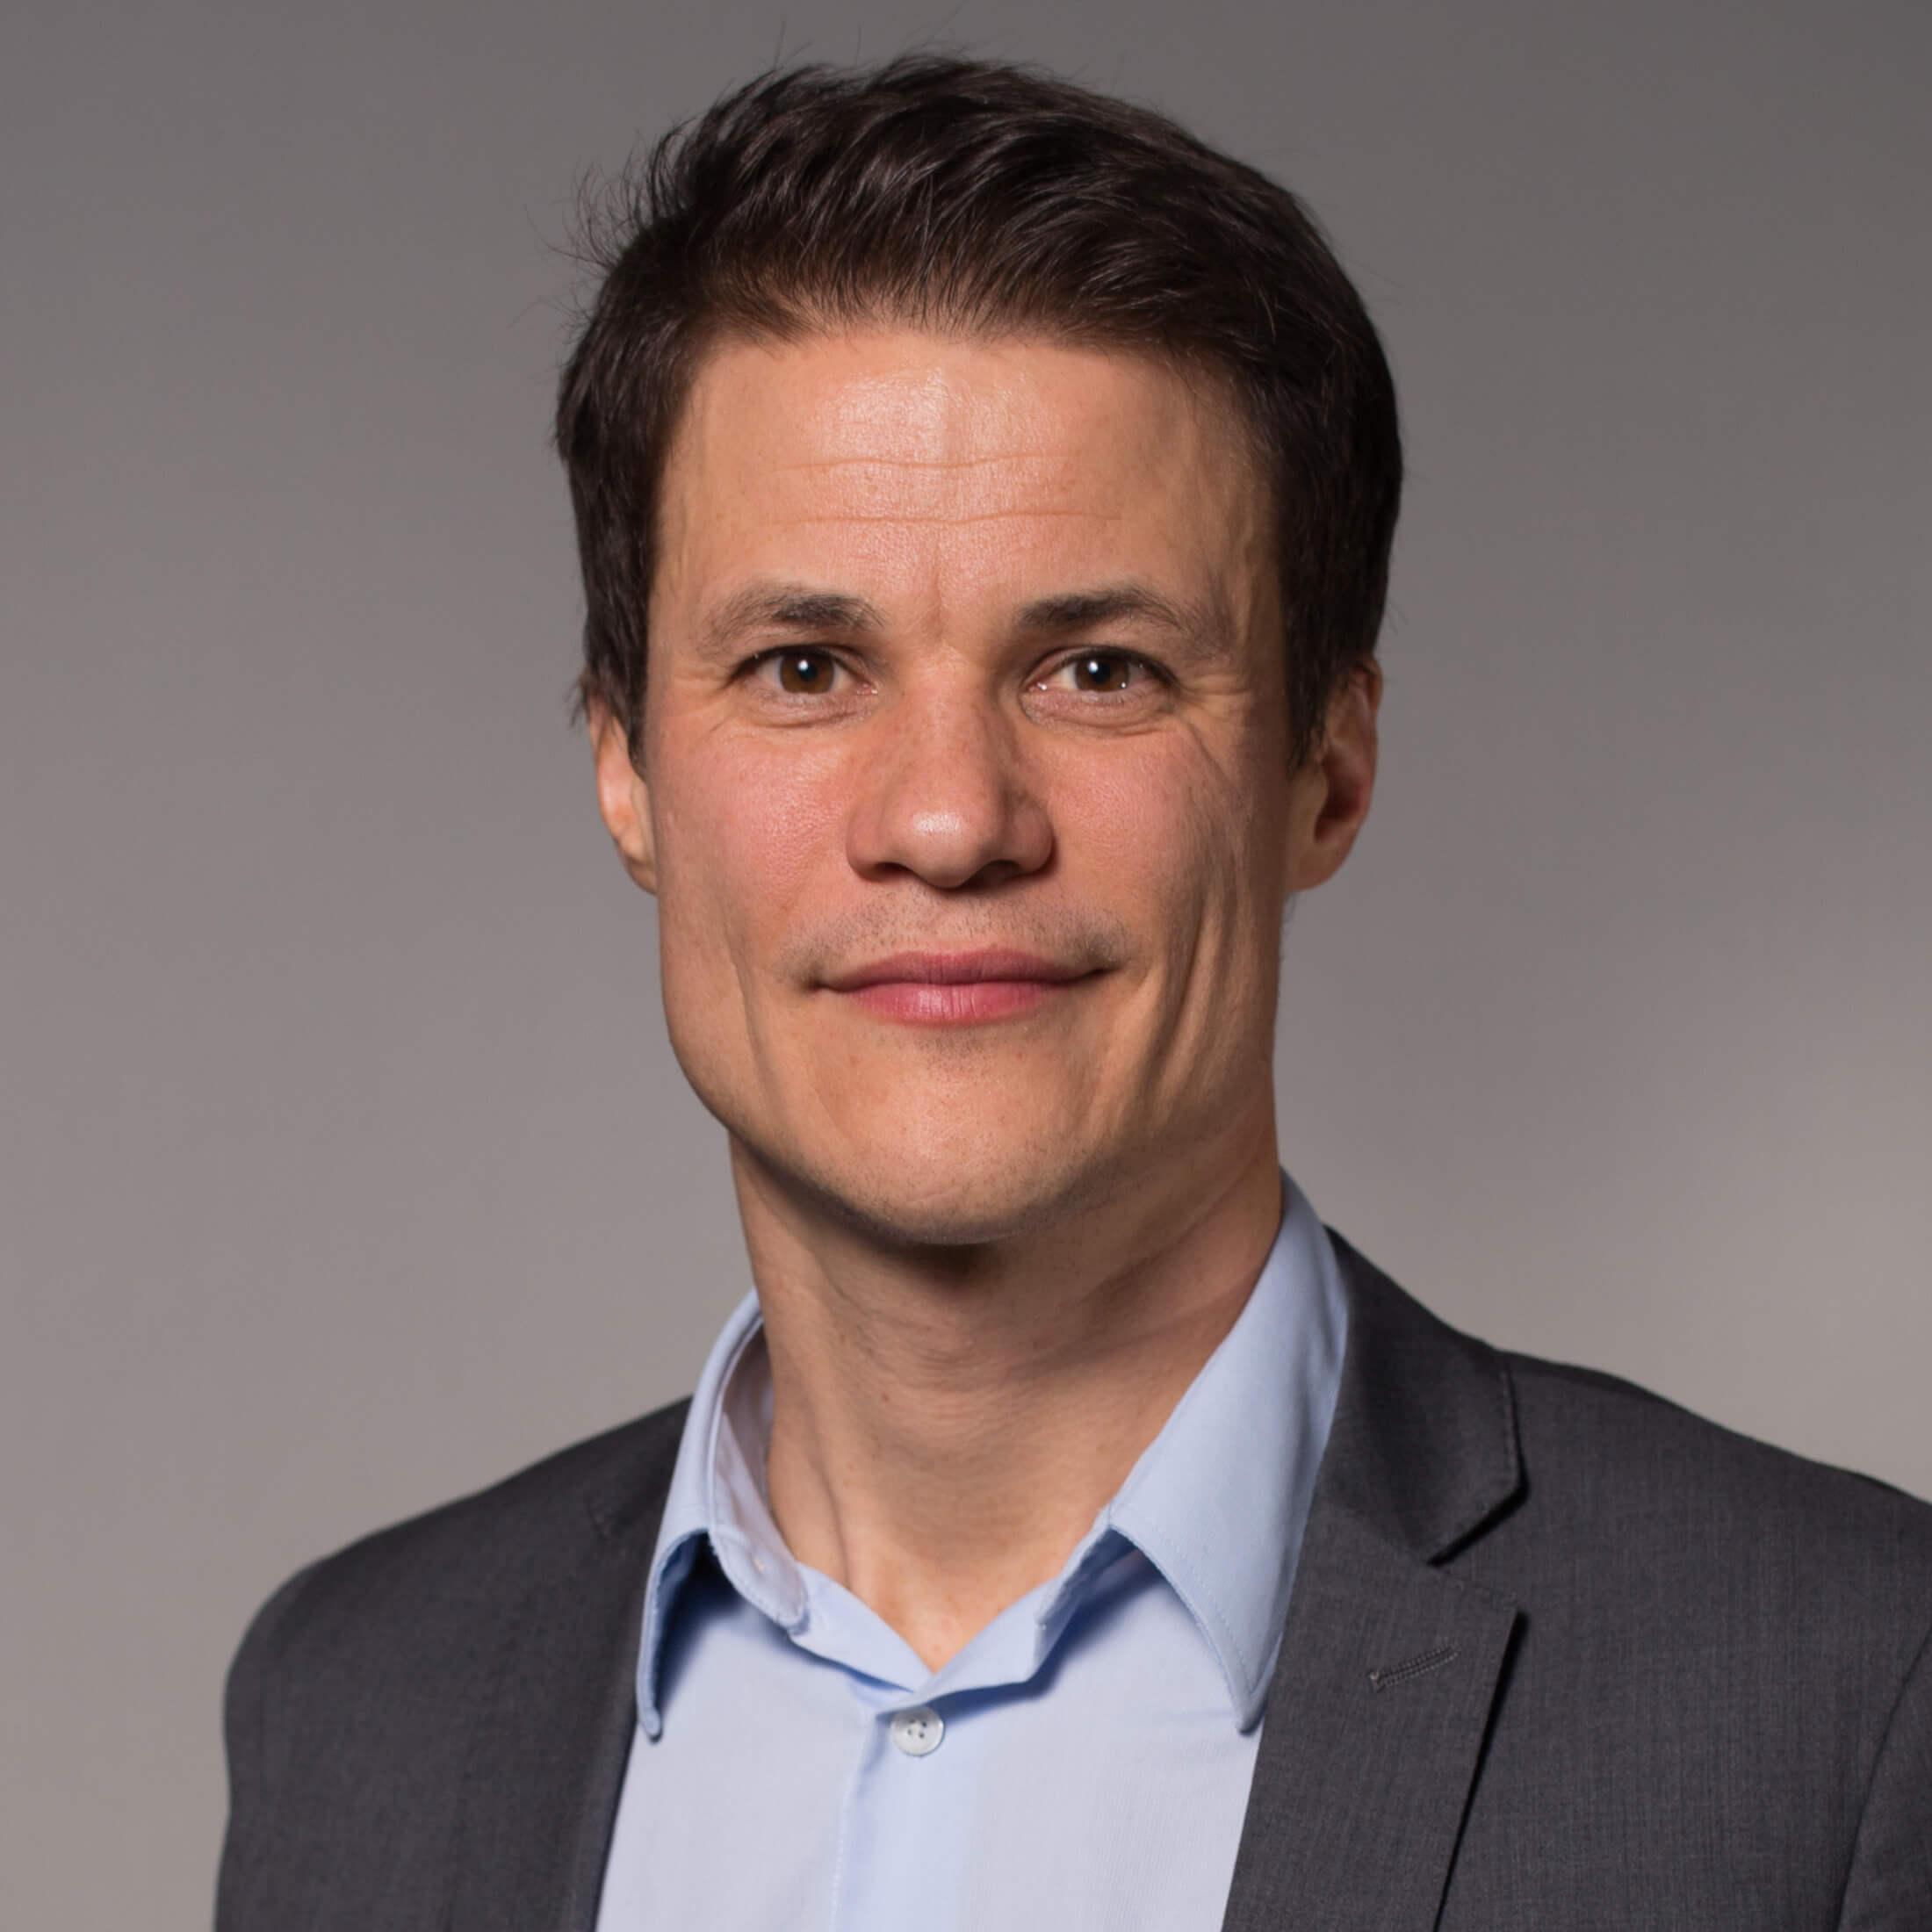 Henrik Svanekiær